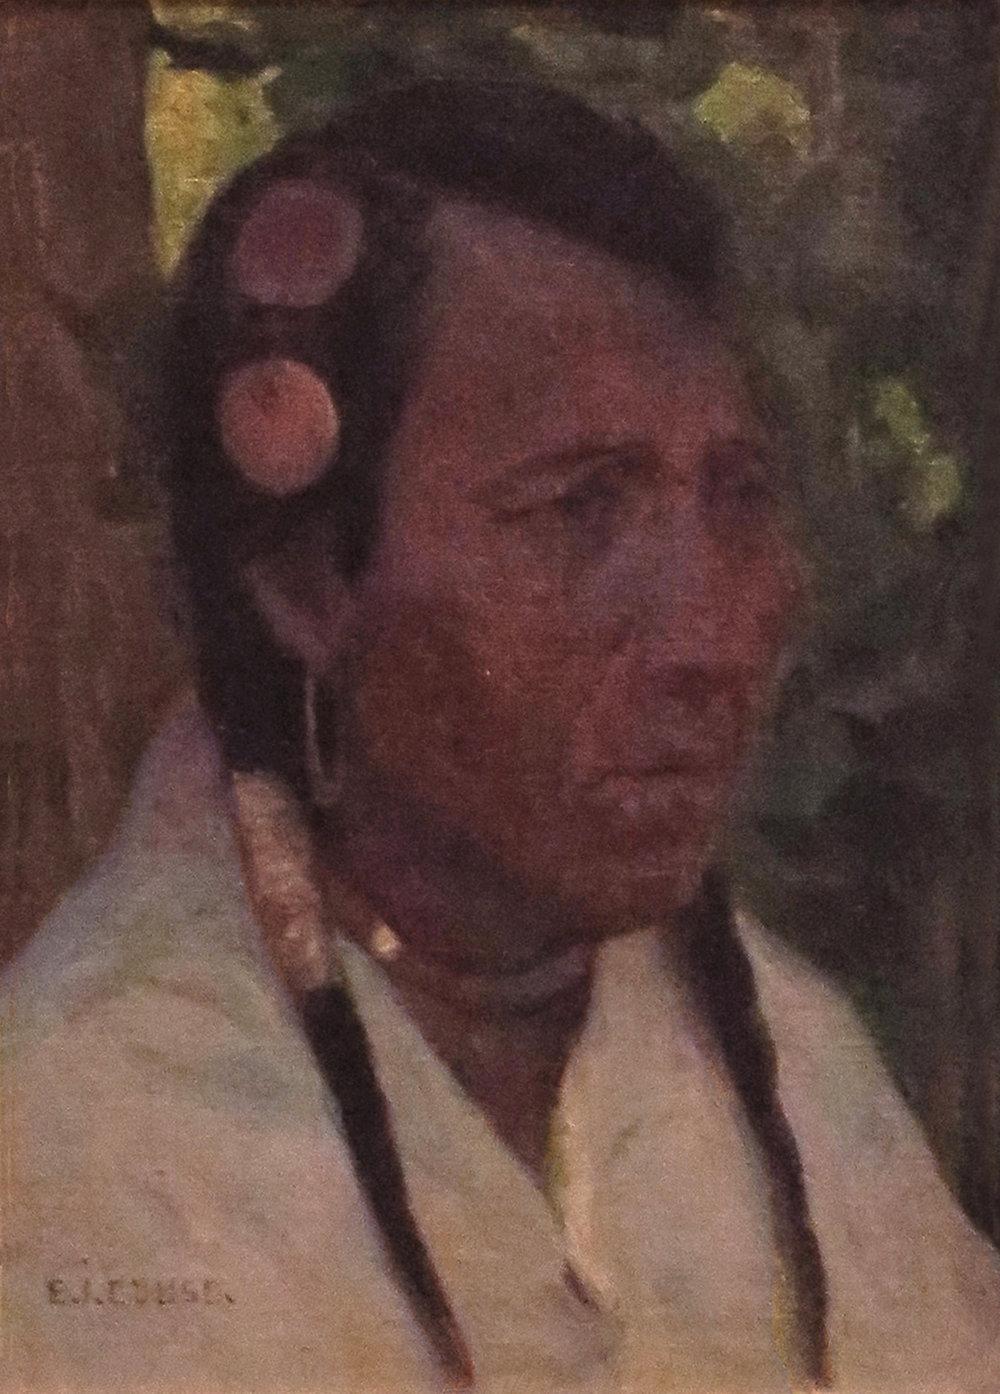 Umatilla Indian Head Portrait, 9 x 6, oil on board